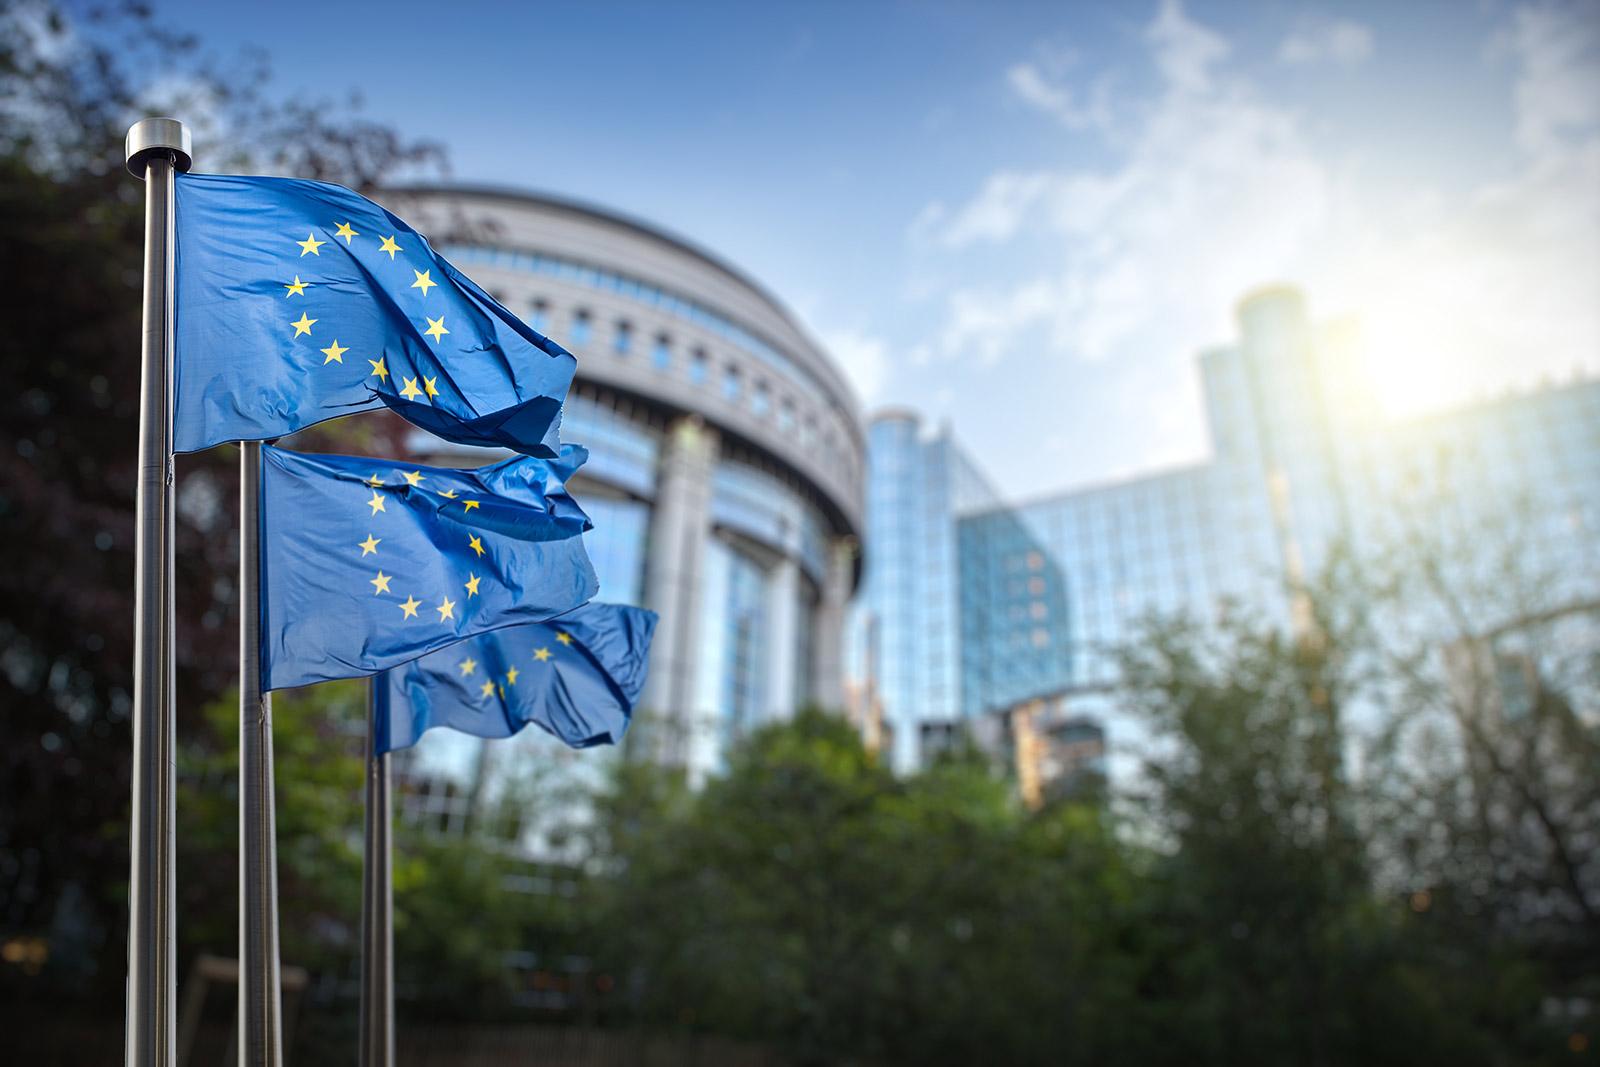 European Parliament decides to instigate single seat treaty change